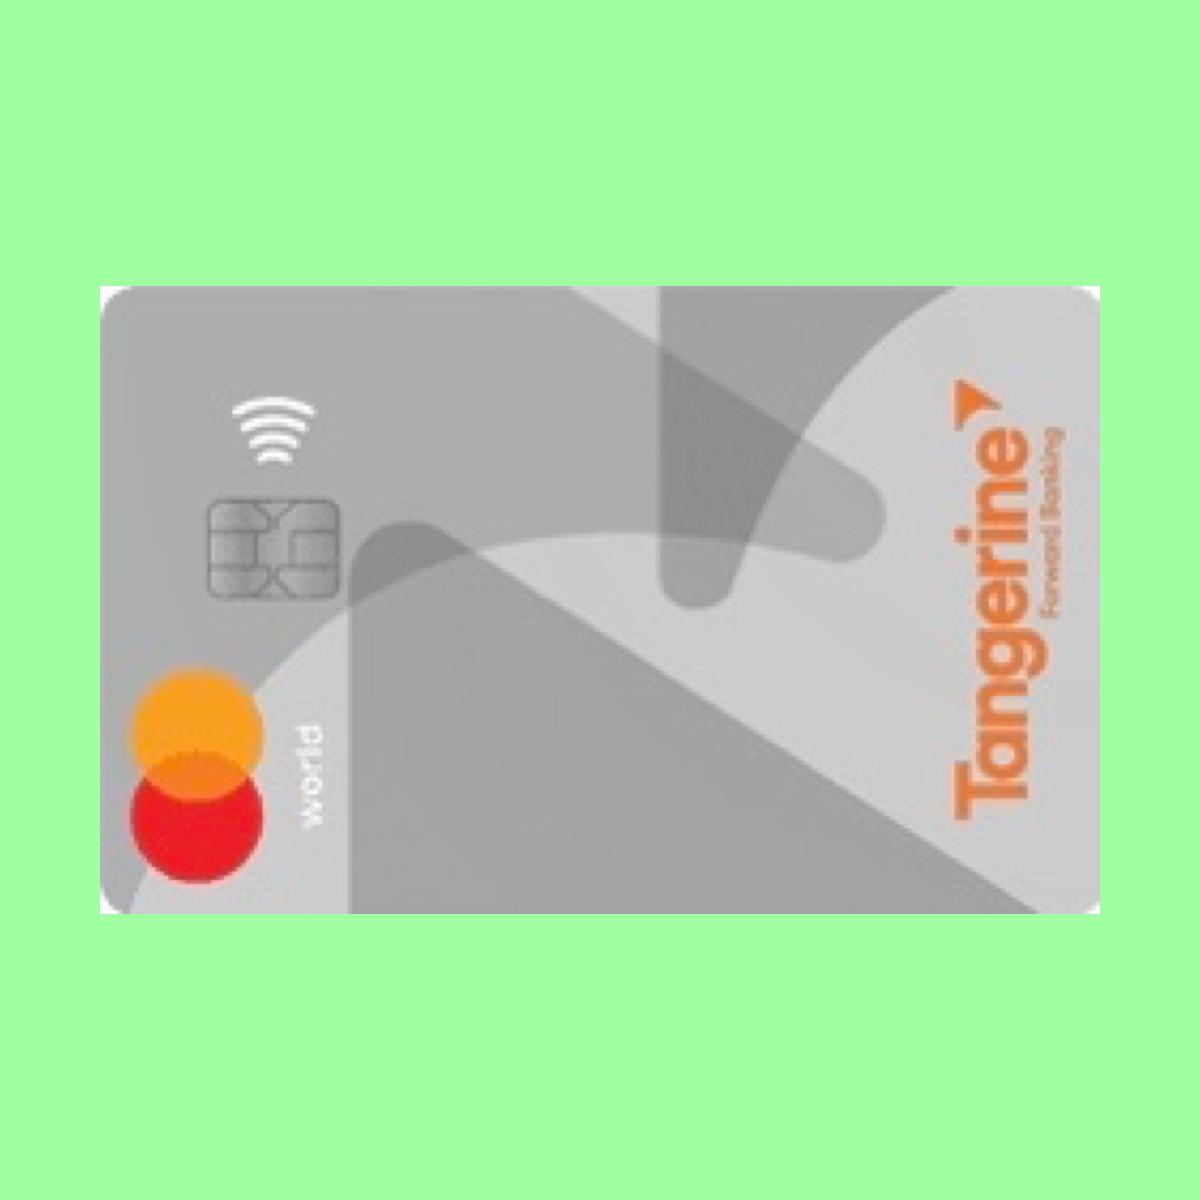 Tangerine World Mastercard The Point Calculator Tangerine Mastercard Reward Card